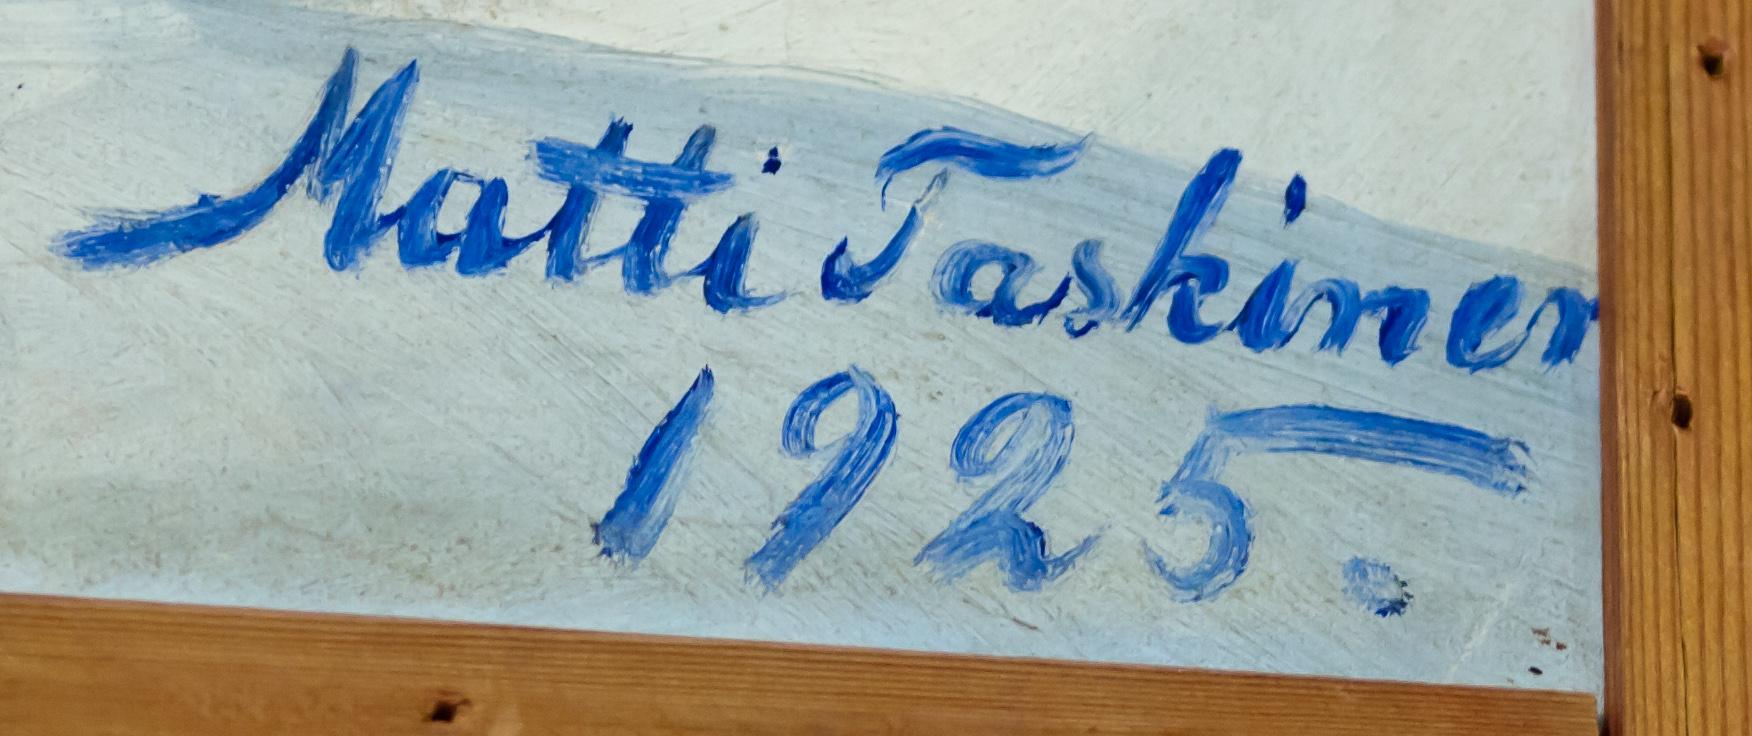 The artwork by Matti Taskinen 1925, photo 183005, 2011-11-12